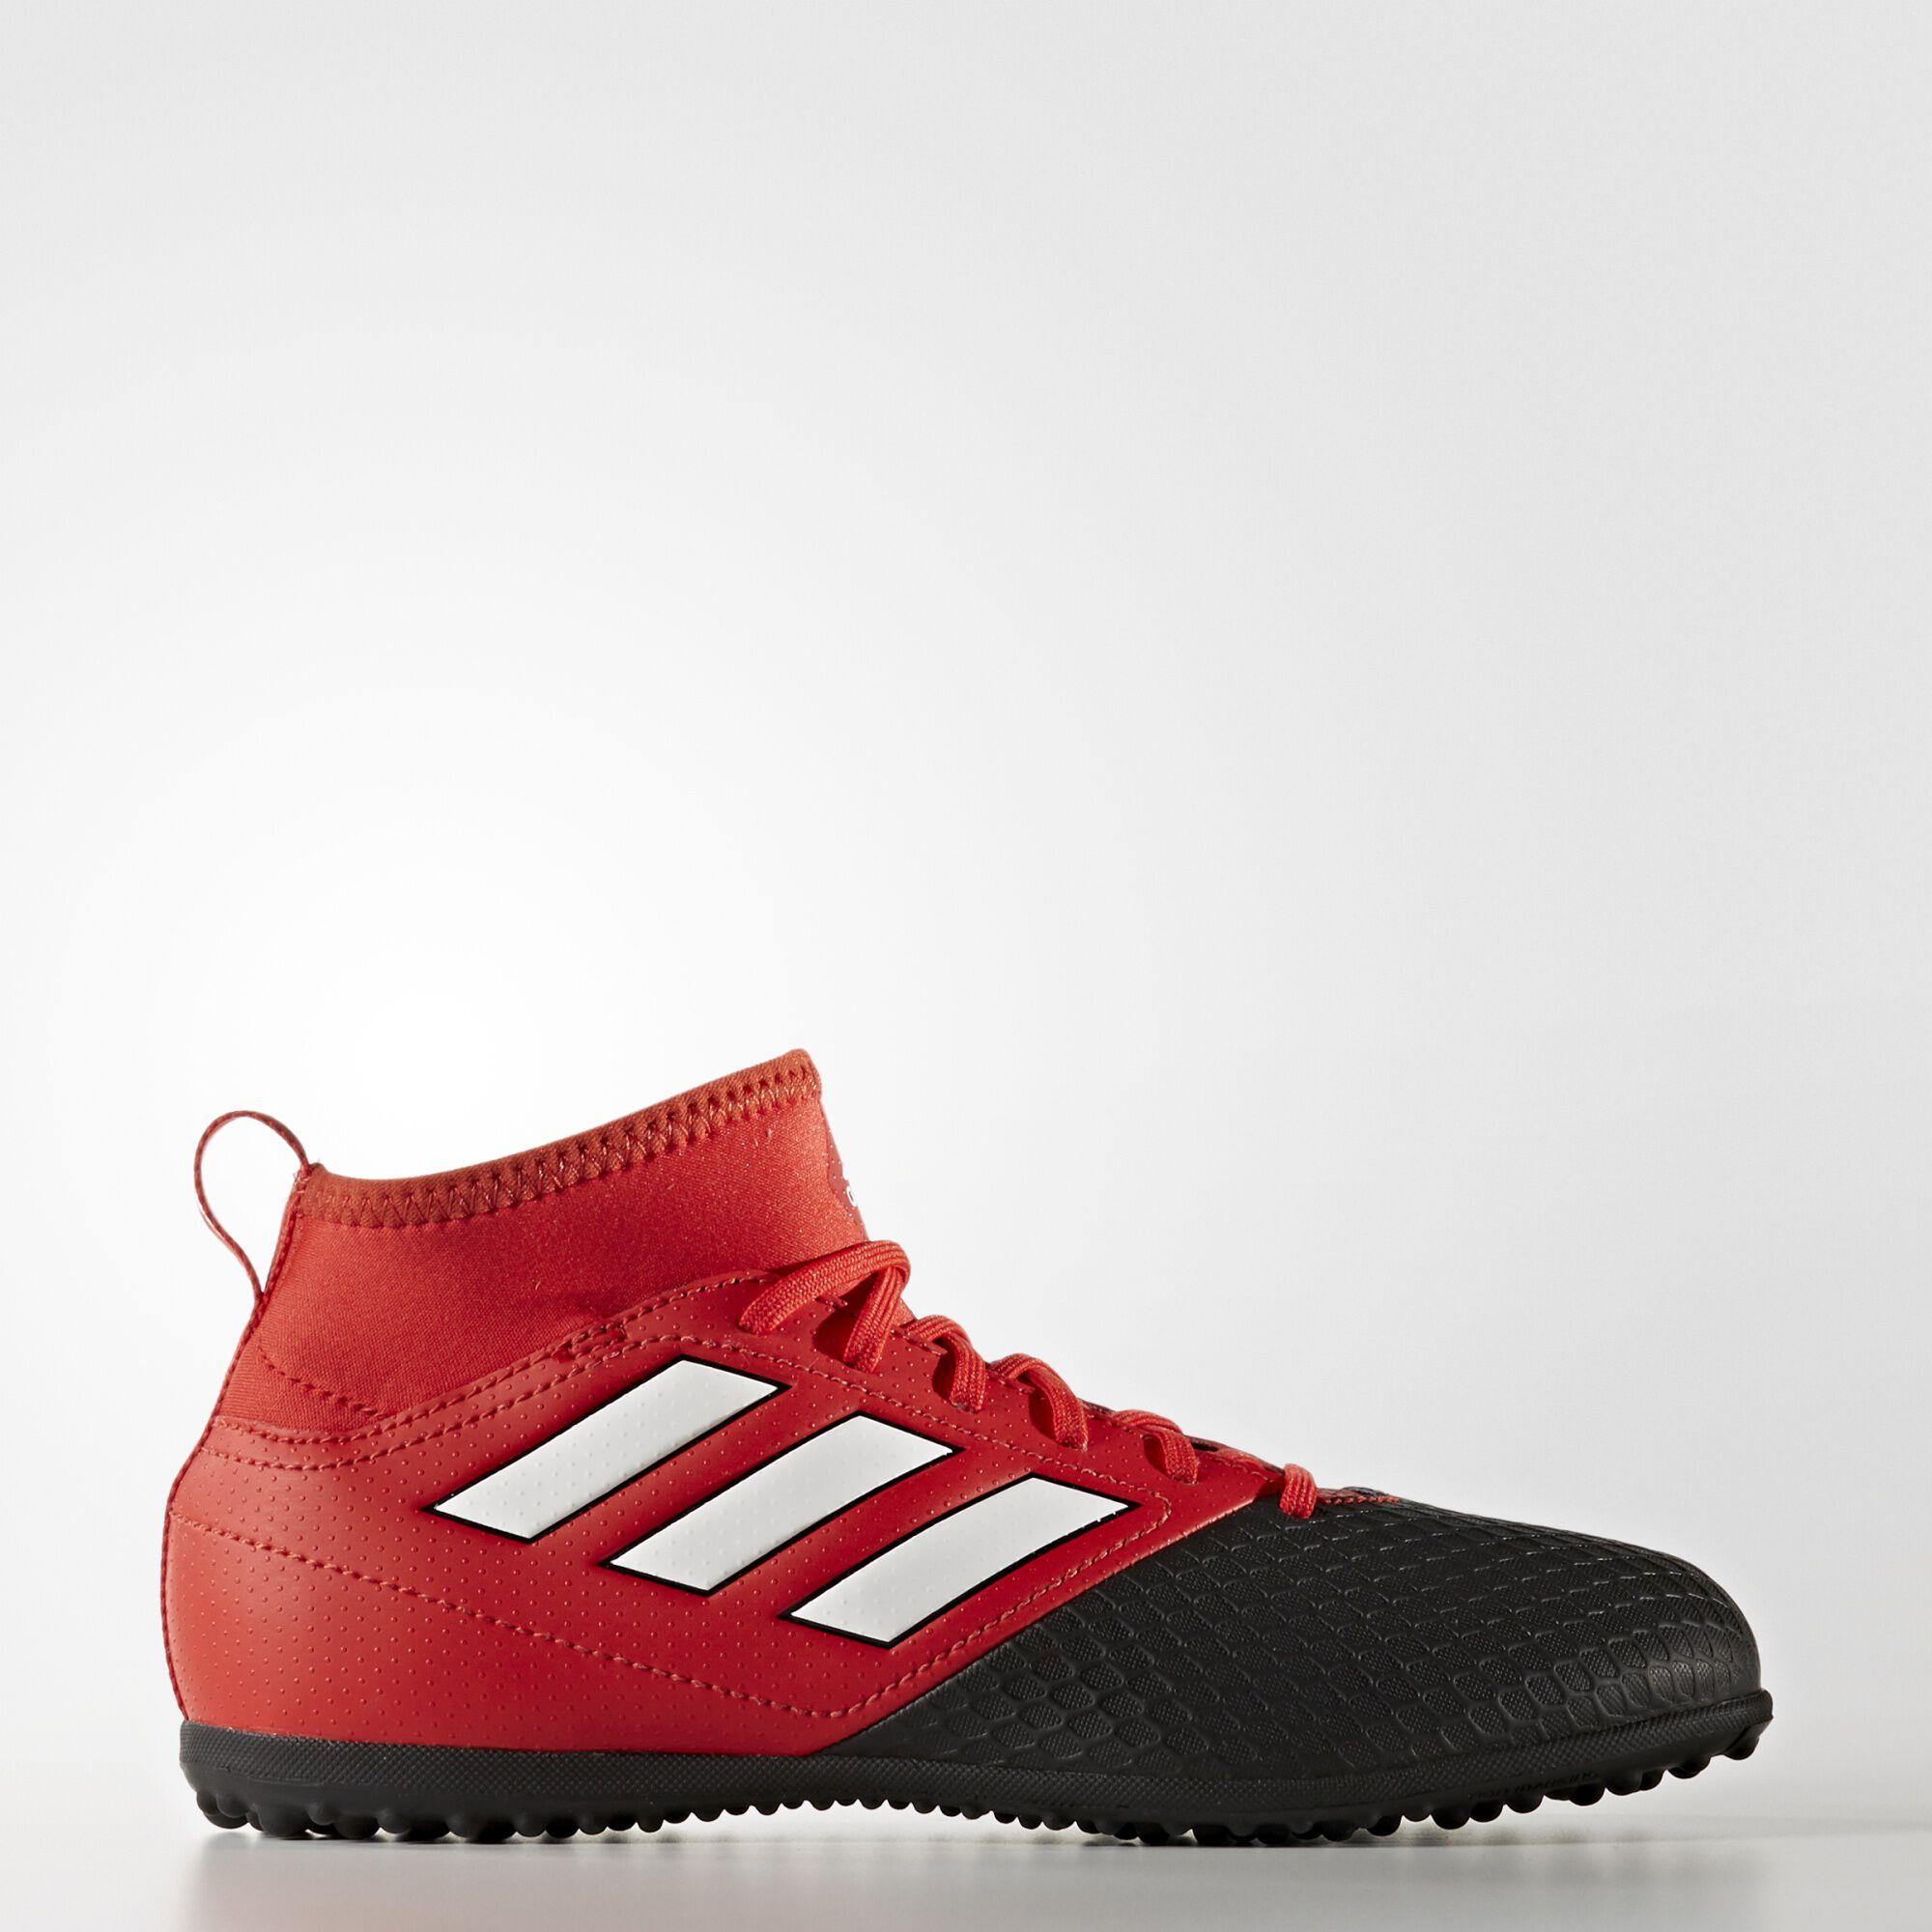 Adidas Unisex Running Shoes